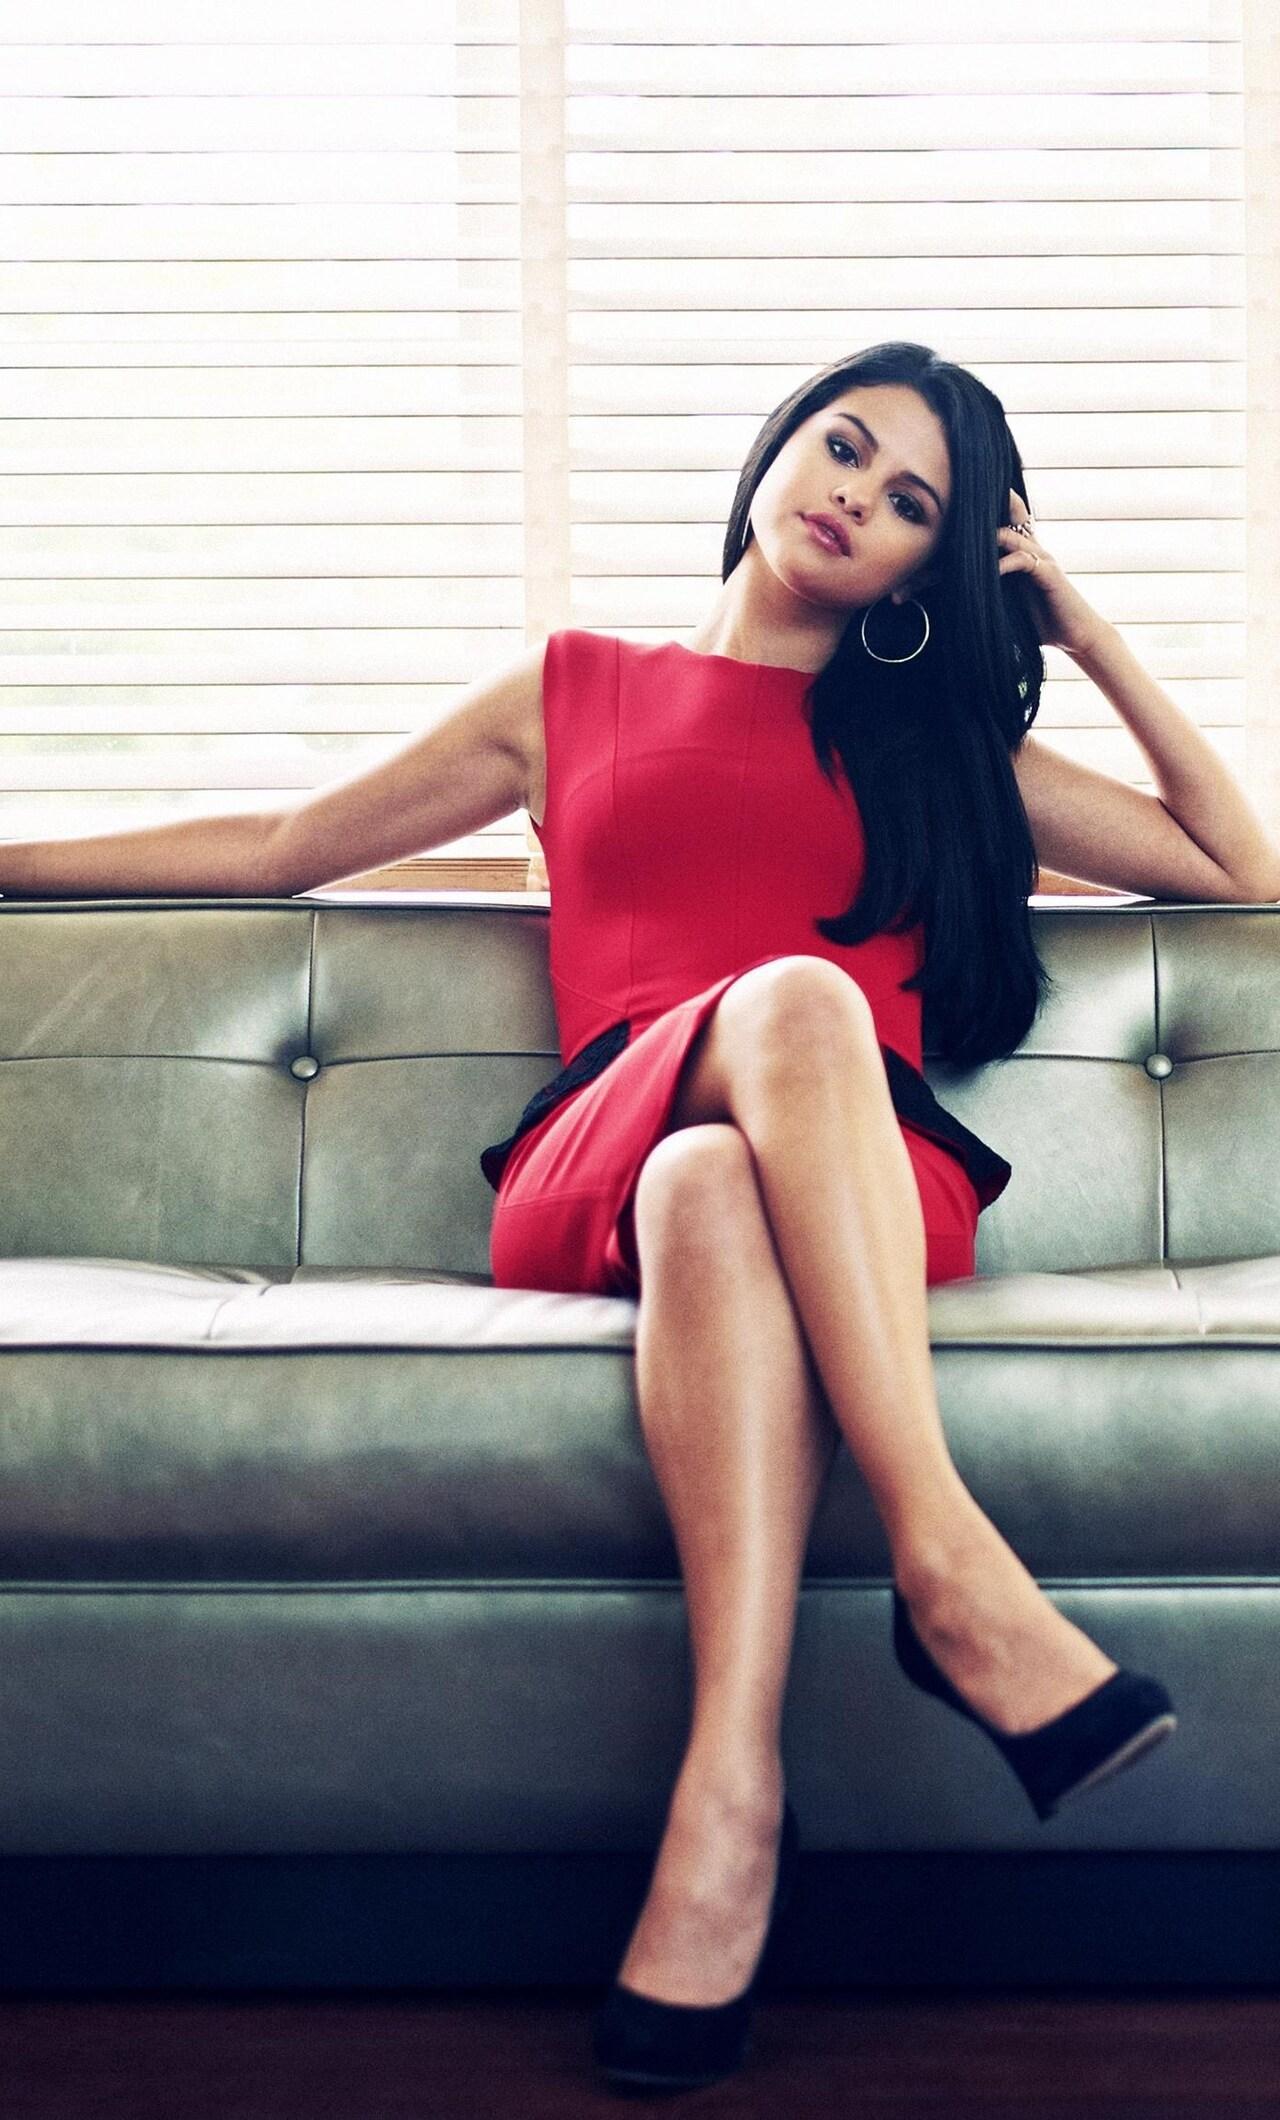 1280x2120 Selena Gomez New iPhone 6+ HD 4k Wallpapers ...